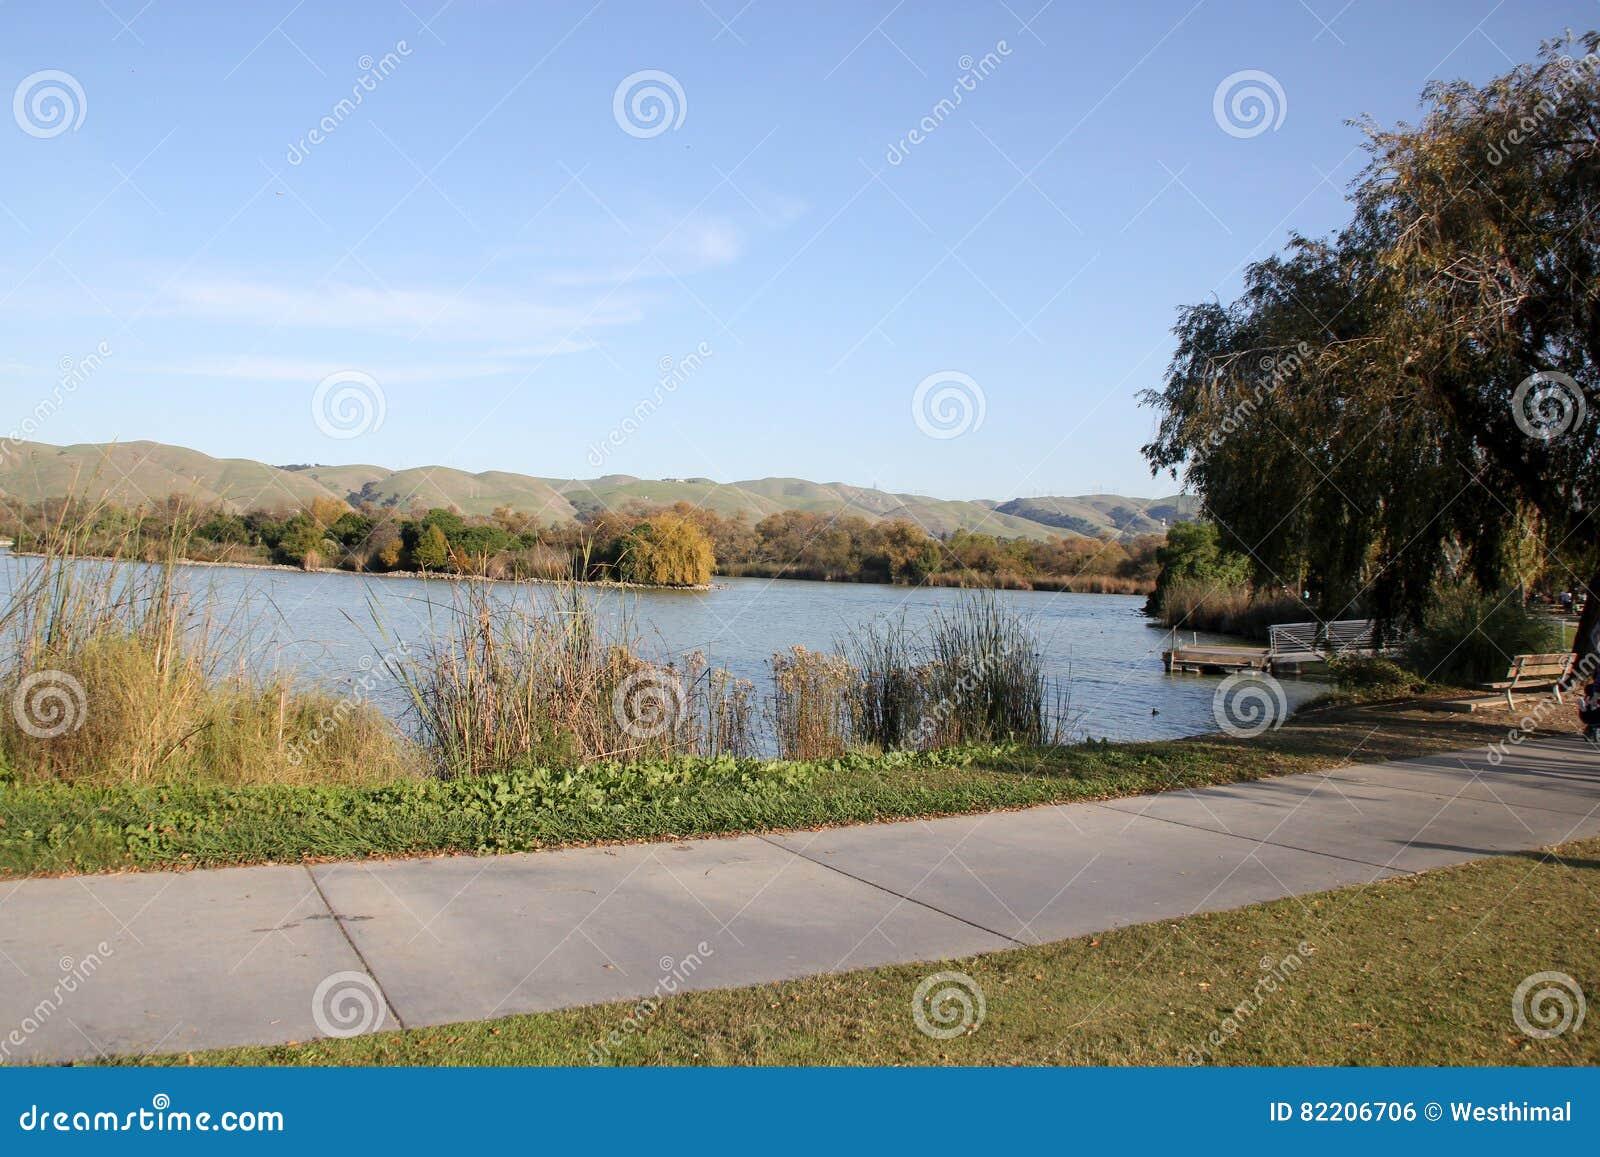 Elizabeth lake central park fremont california stock for Lake elizabeth fishing